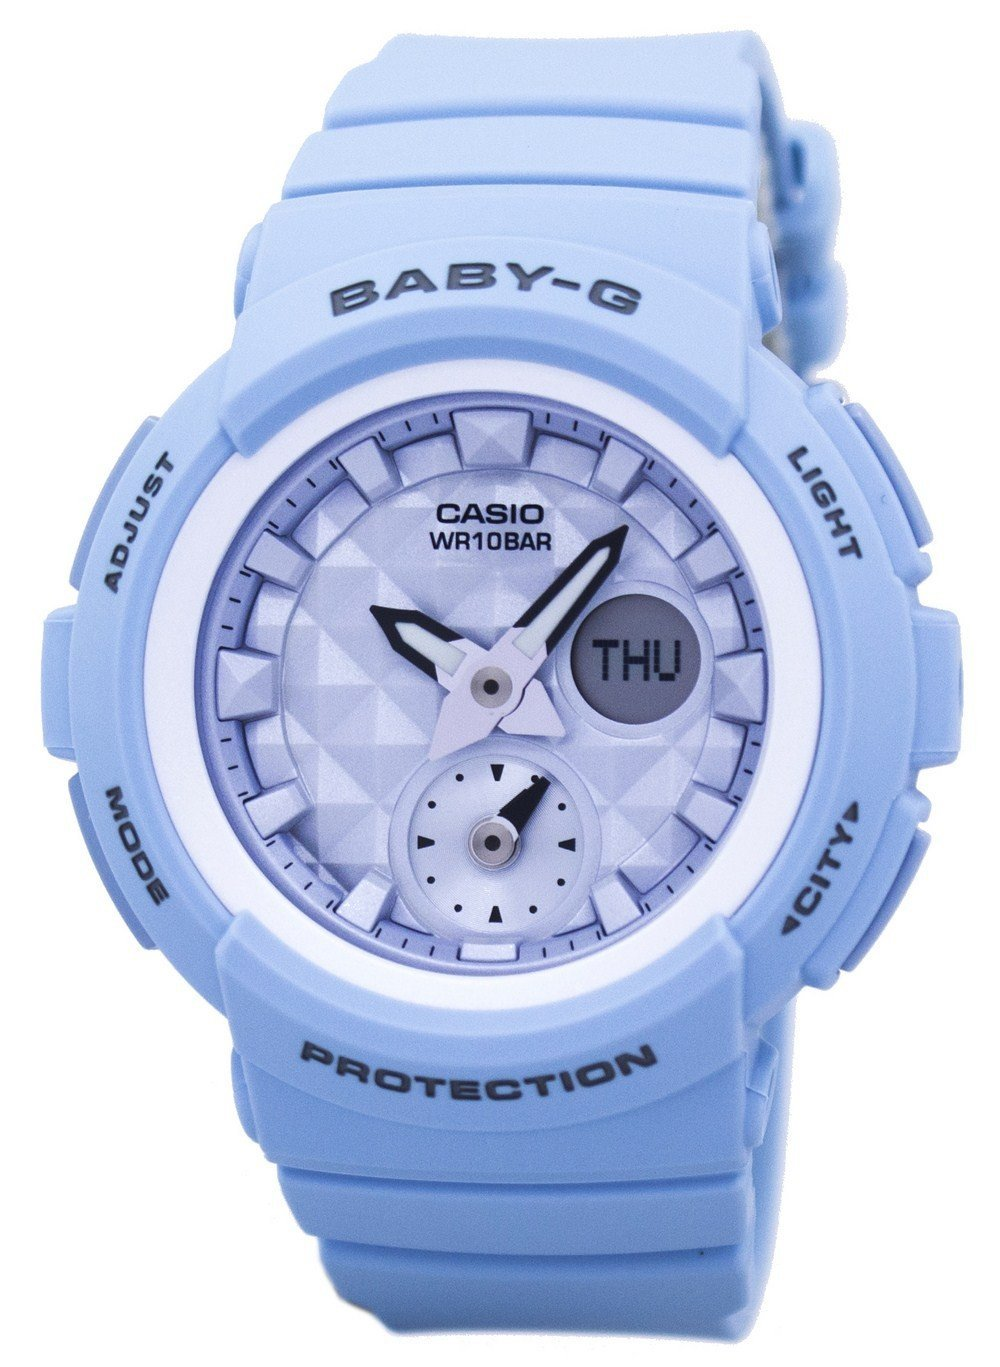 Casio Baby-G Shock Resistant World Time Analog Digital BGA-190BE-2A Womens Watch